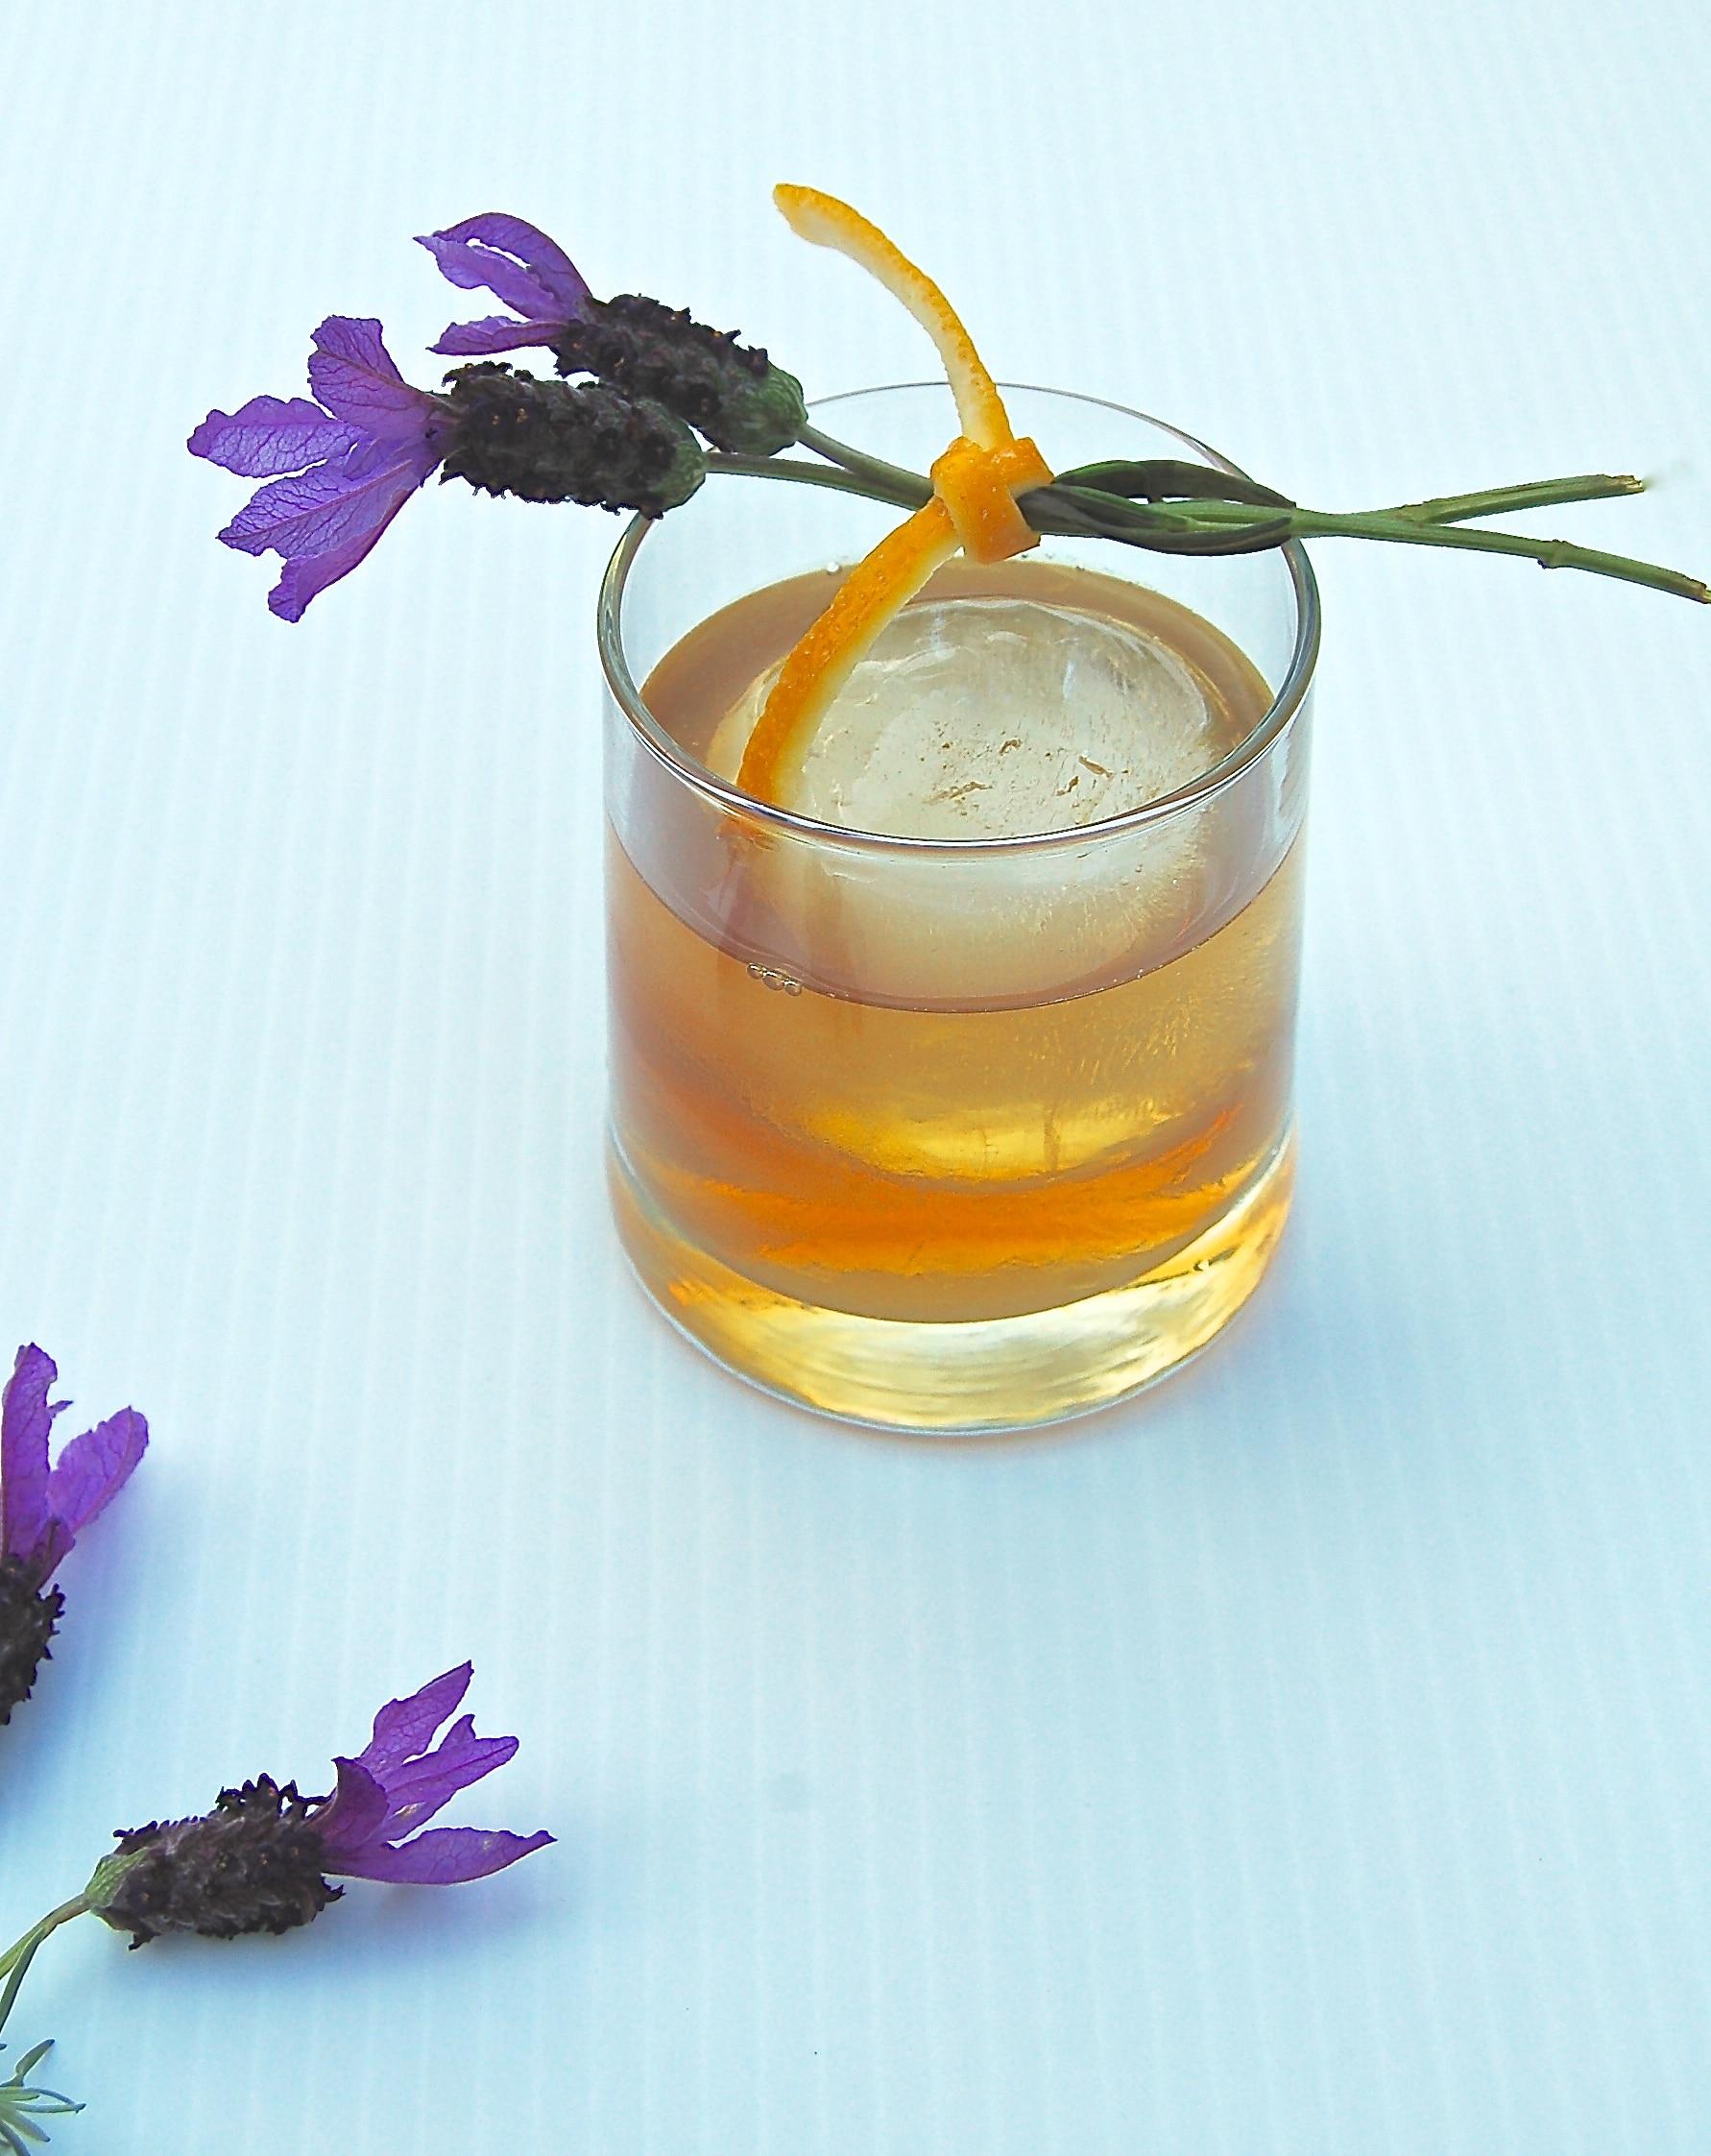 Gidget_SpringtimeSmash 3